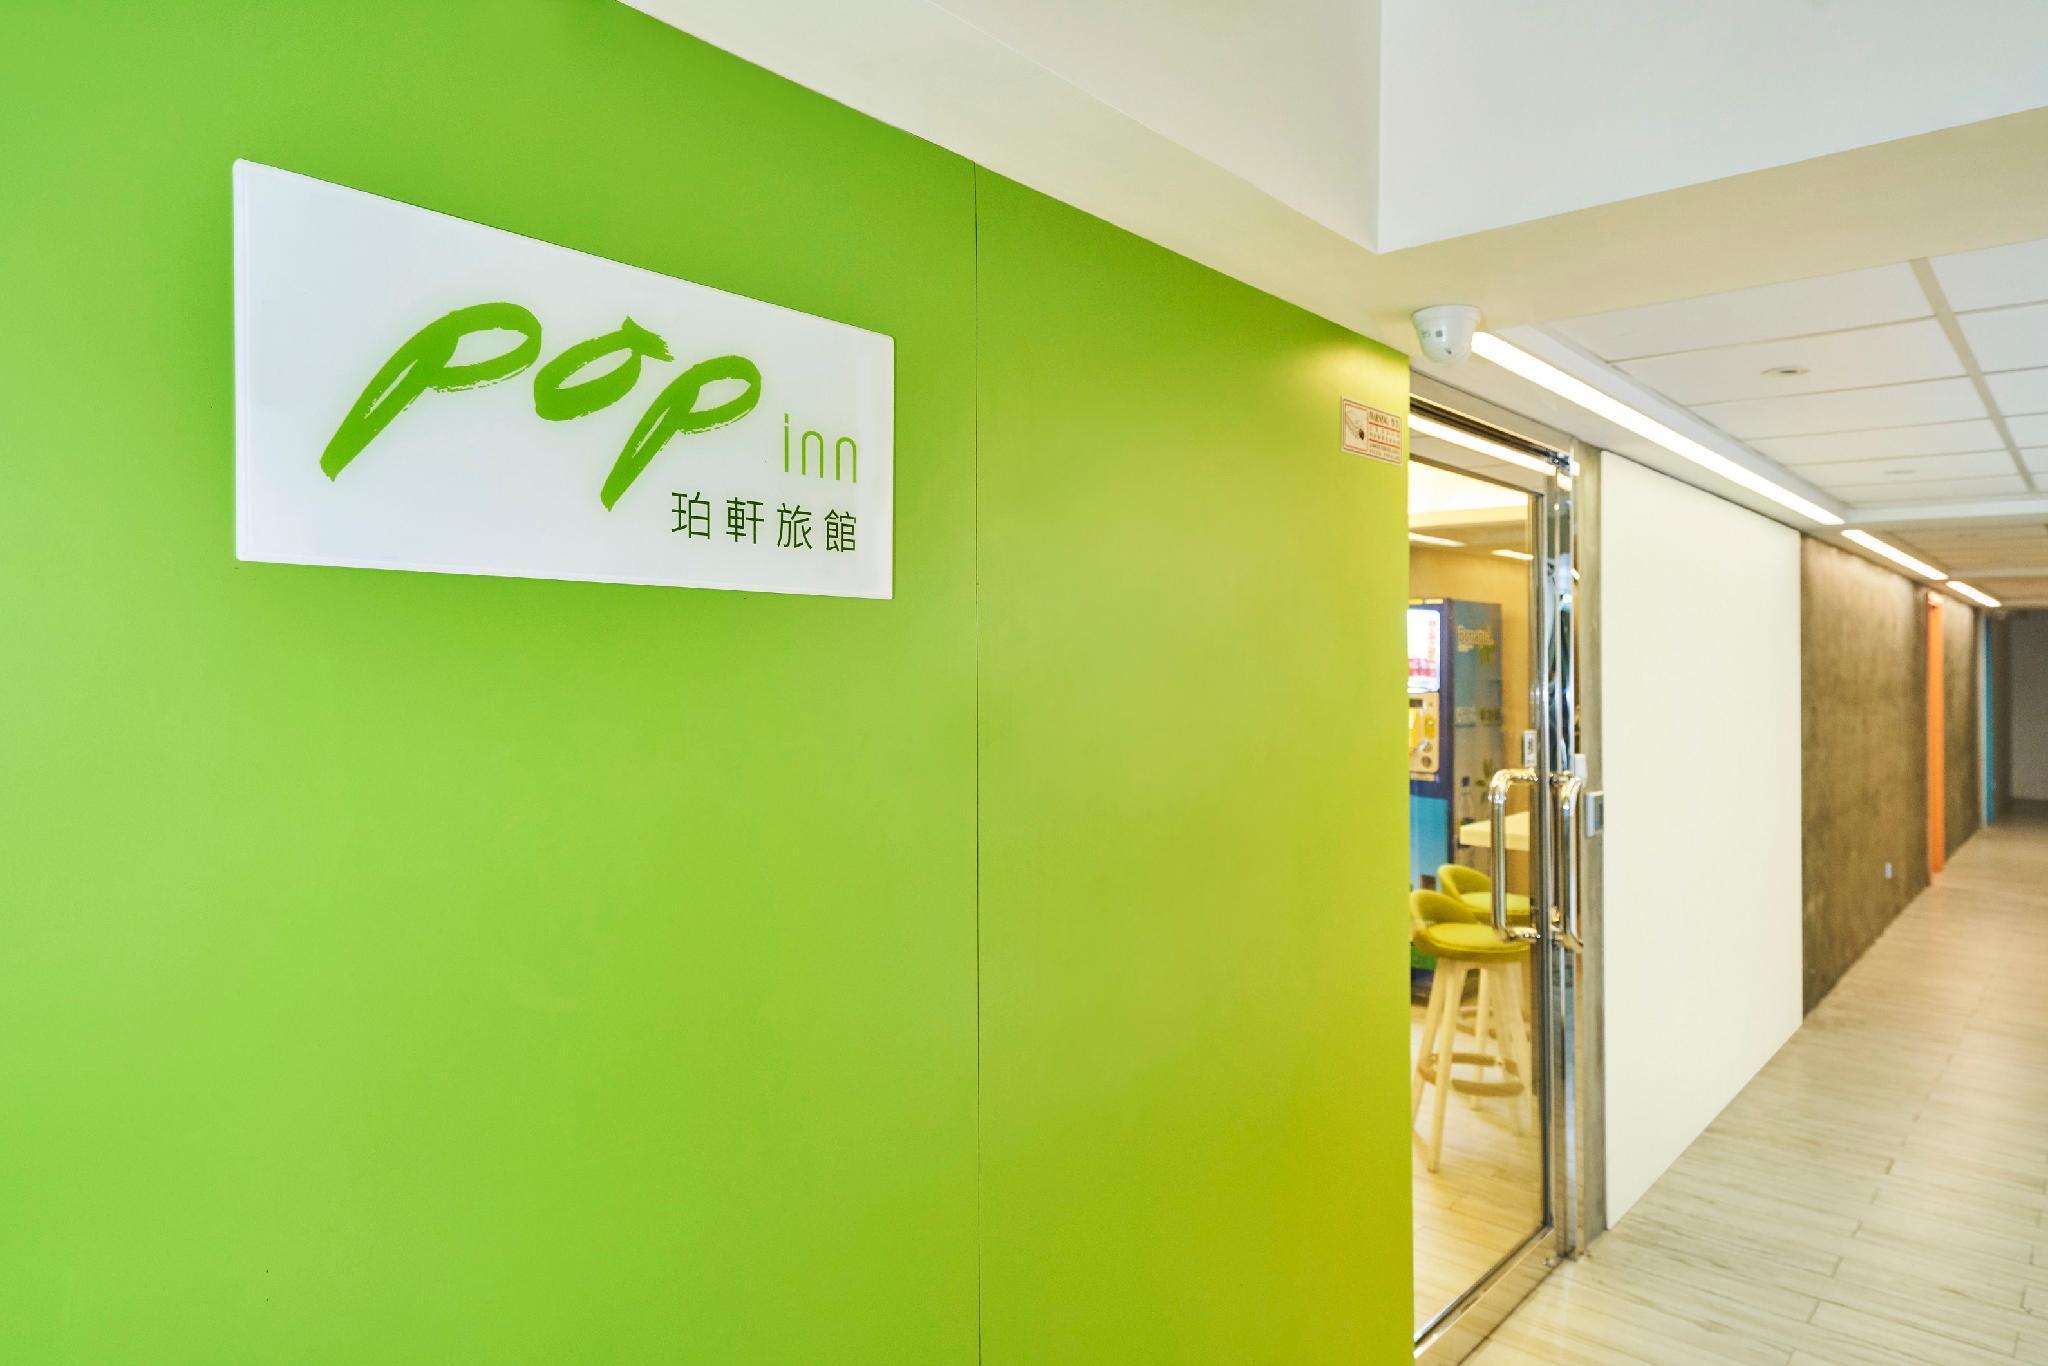 Pop Inn